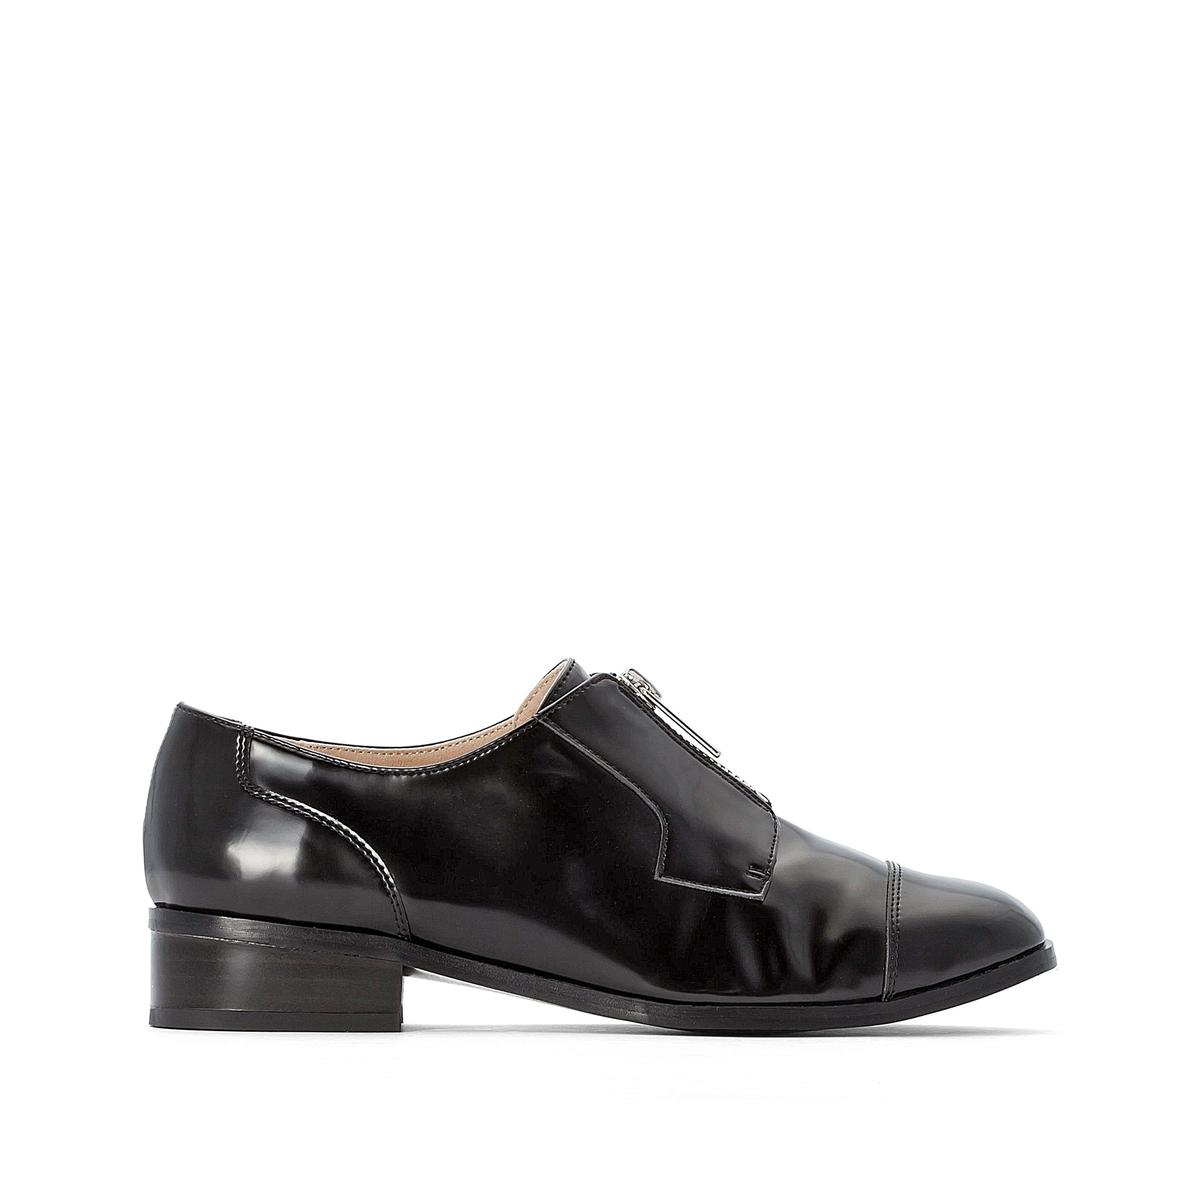 цена Ботинки-дерби La Redoute С застежкой на молнию 36 черный онлайн в 2017 году